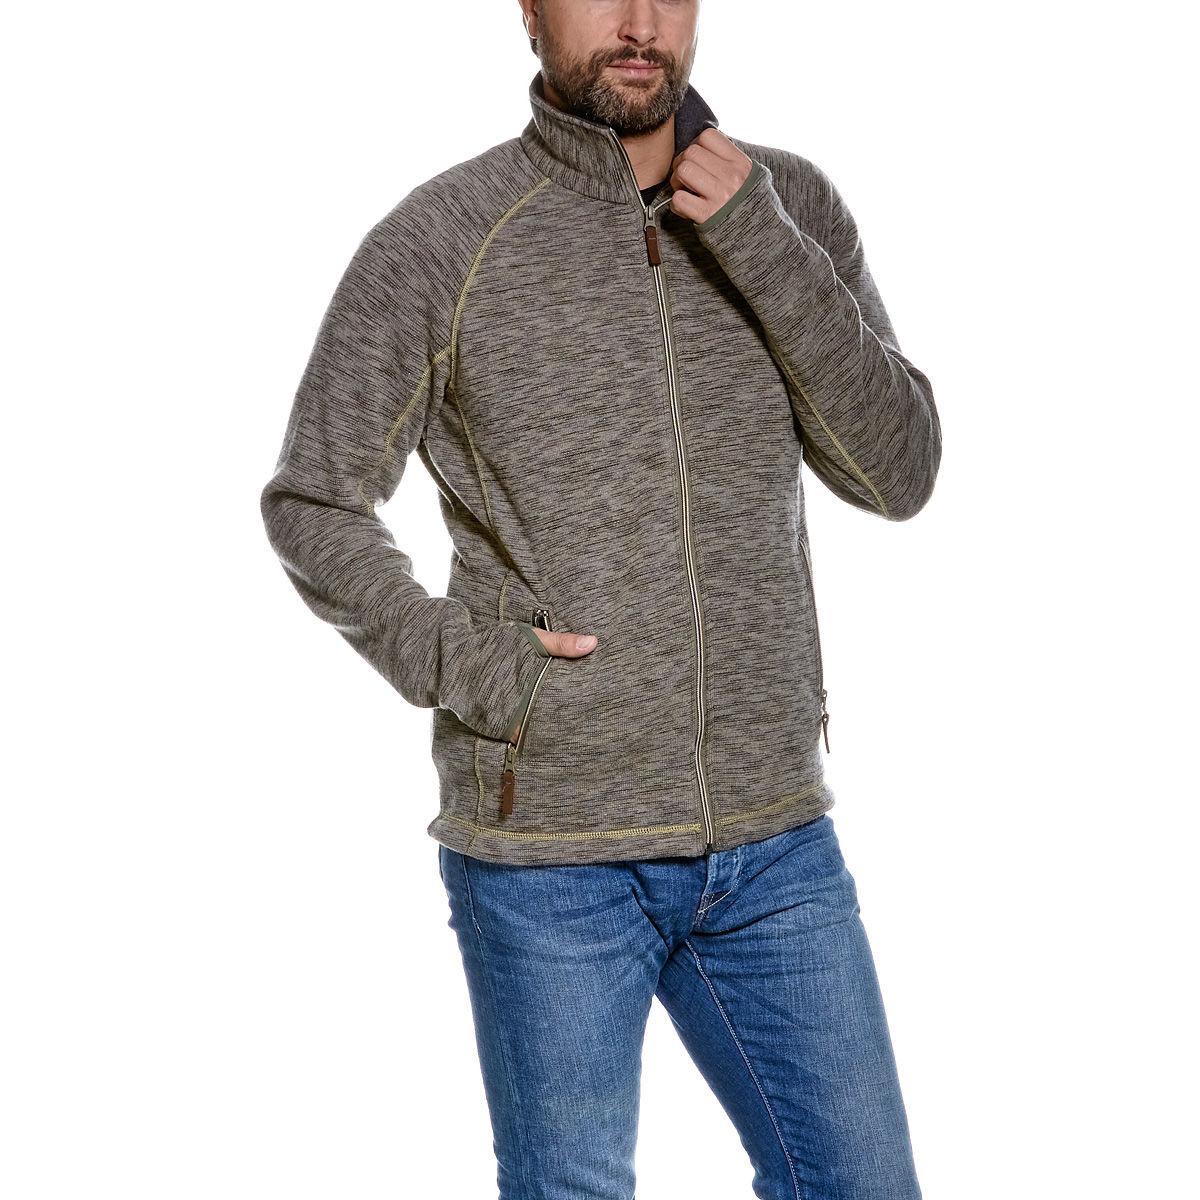 Jacket Jacket Joskin Olive Joskin Tatonka Herren Tatonka Olive Herren dCBeox